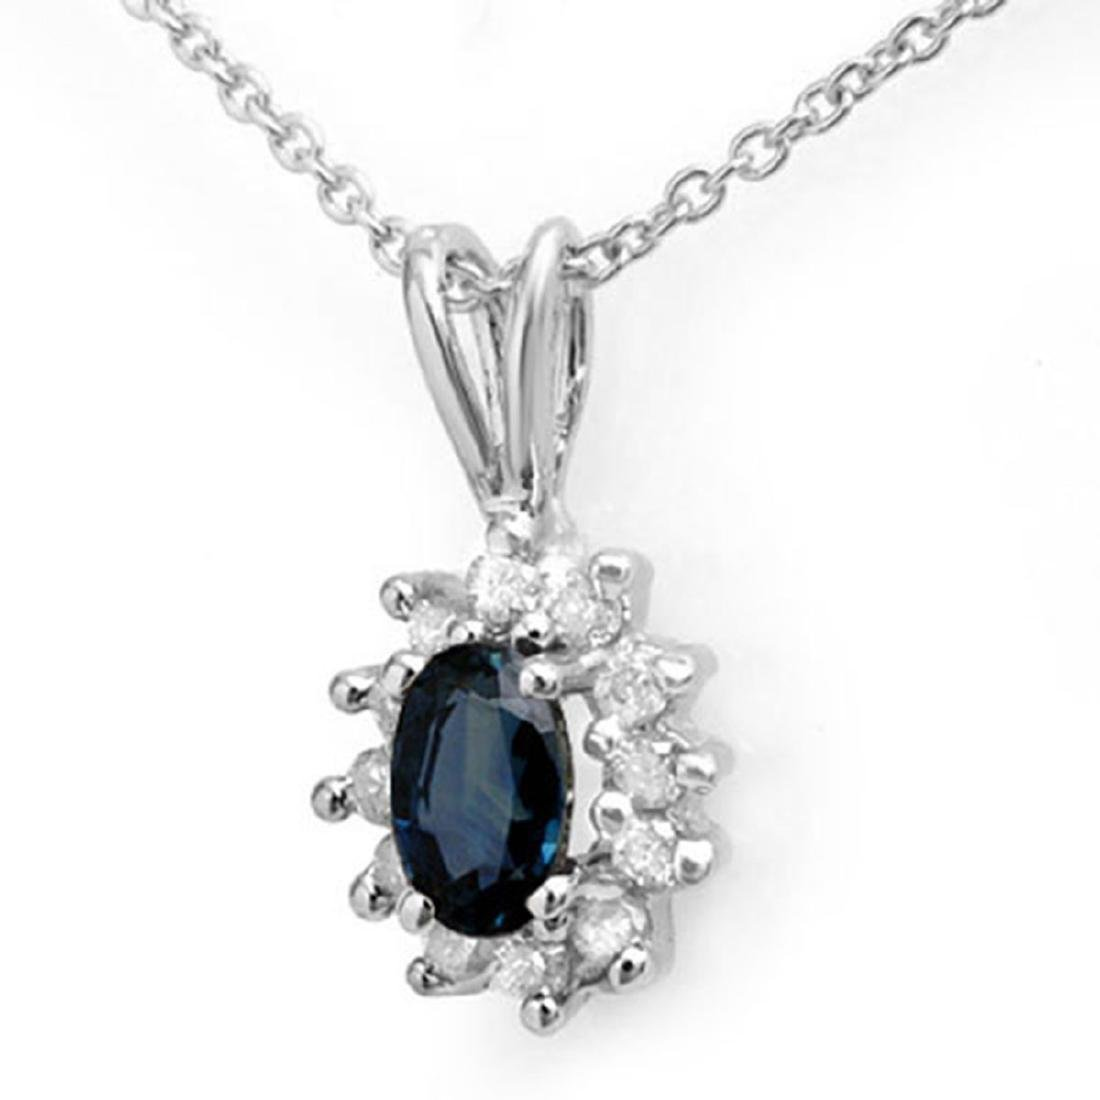 0.51 CTW Genuine Blue Sapphire & Diamond Pendant 14K